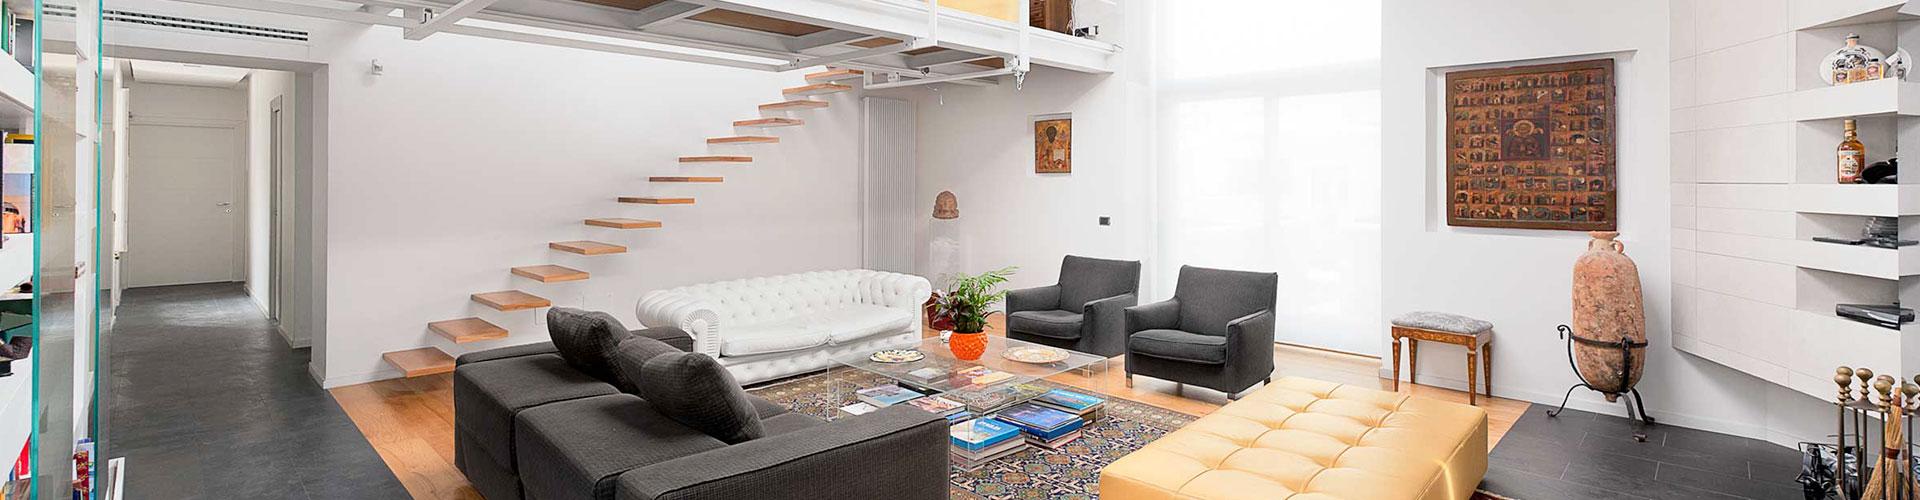 appartamento in vendita salgareda